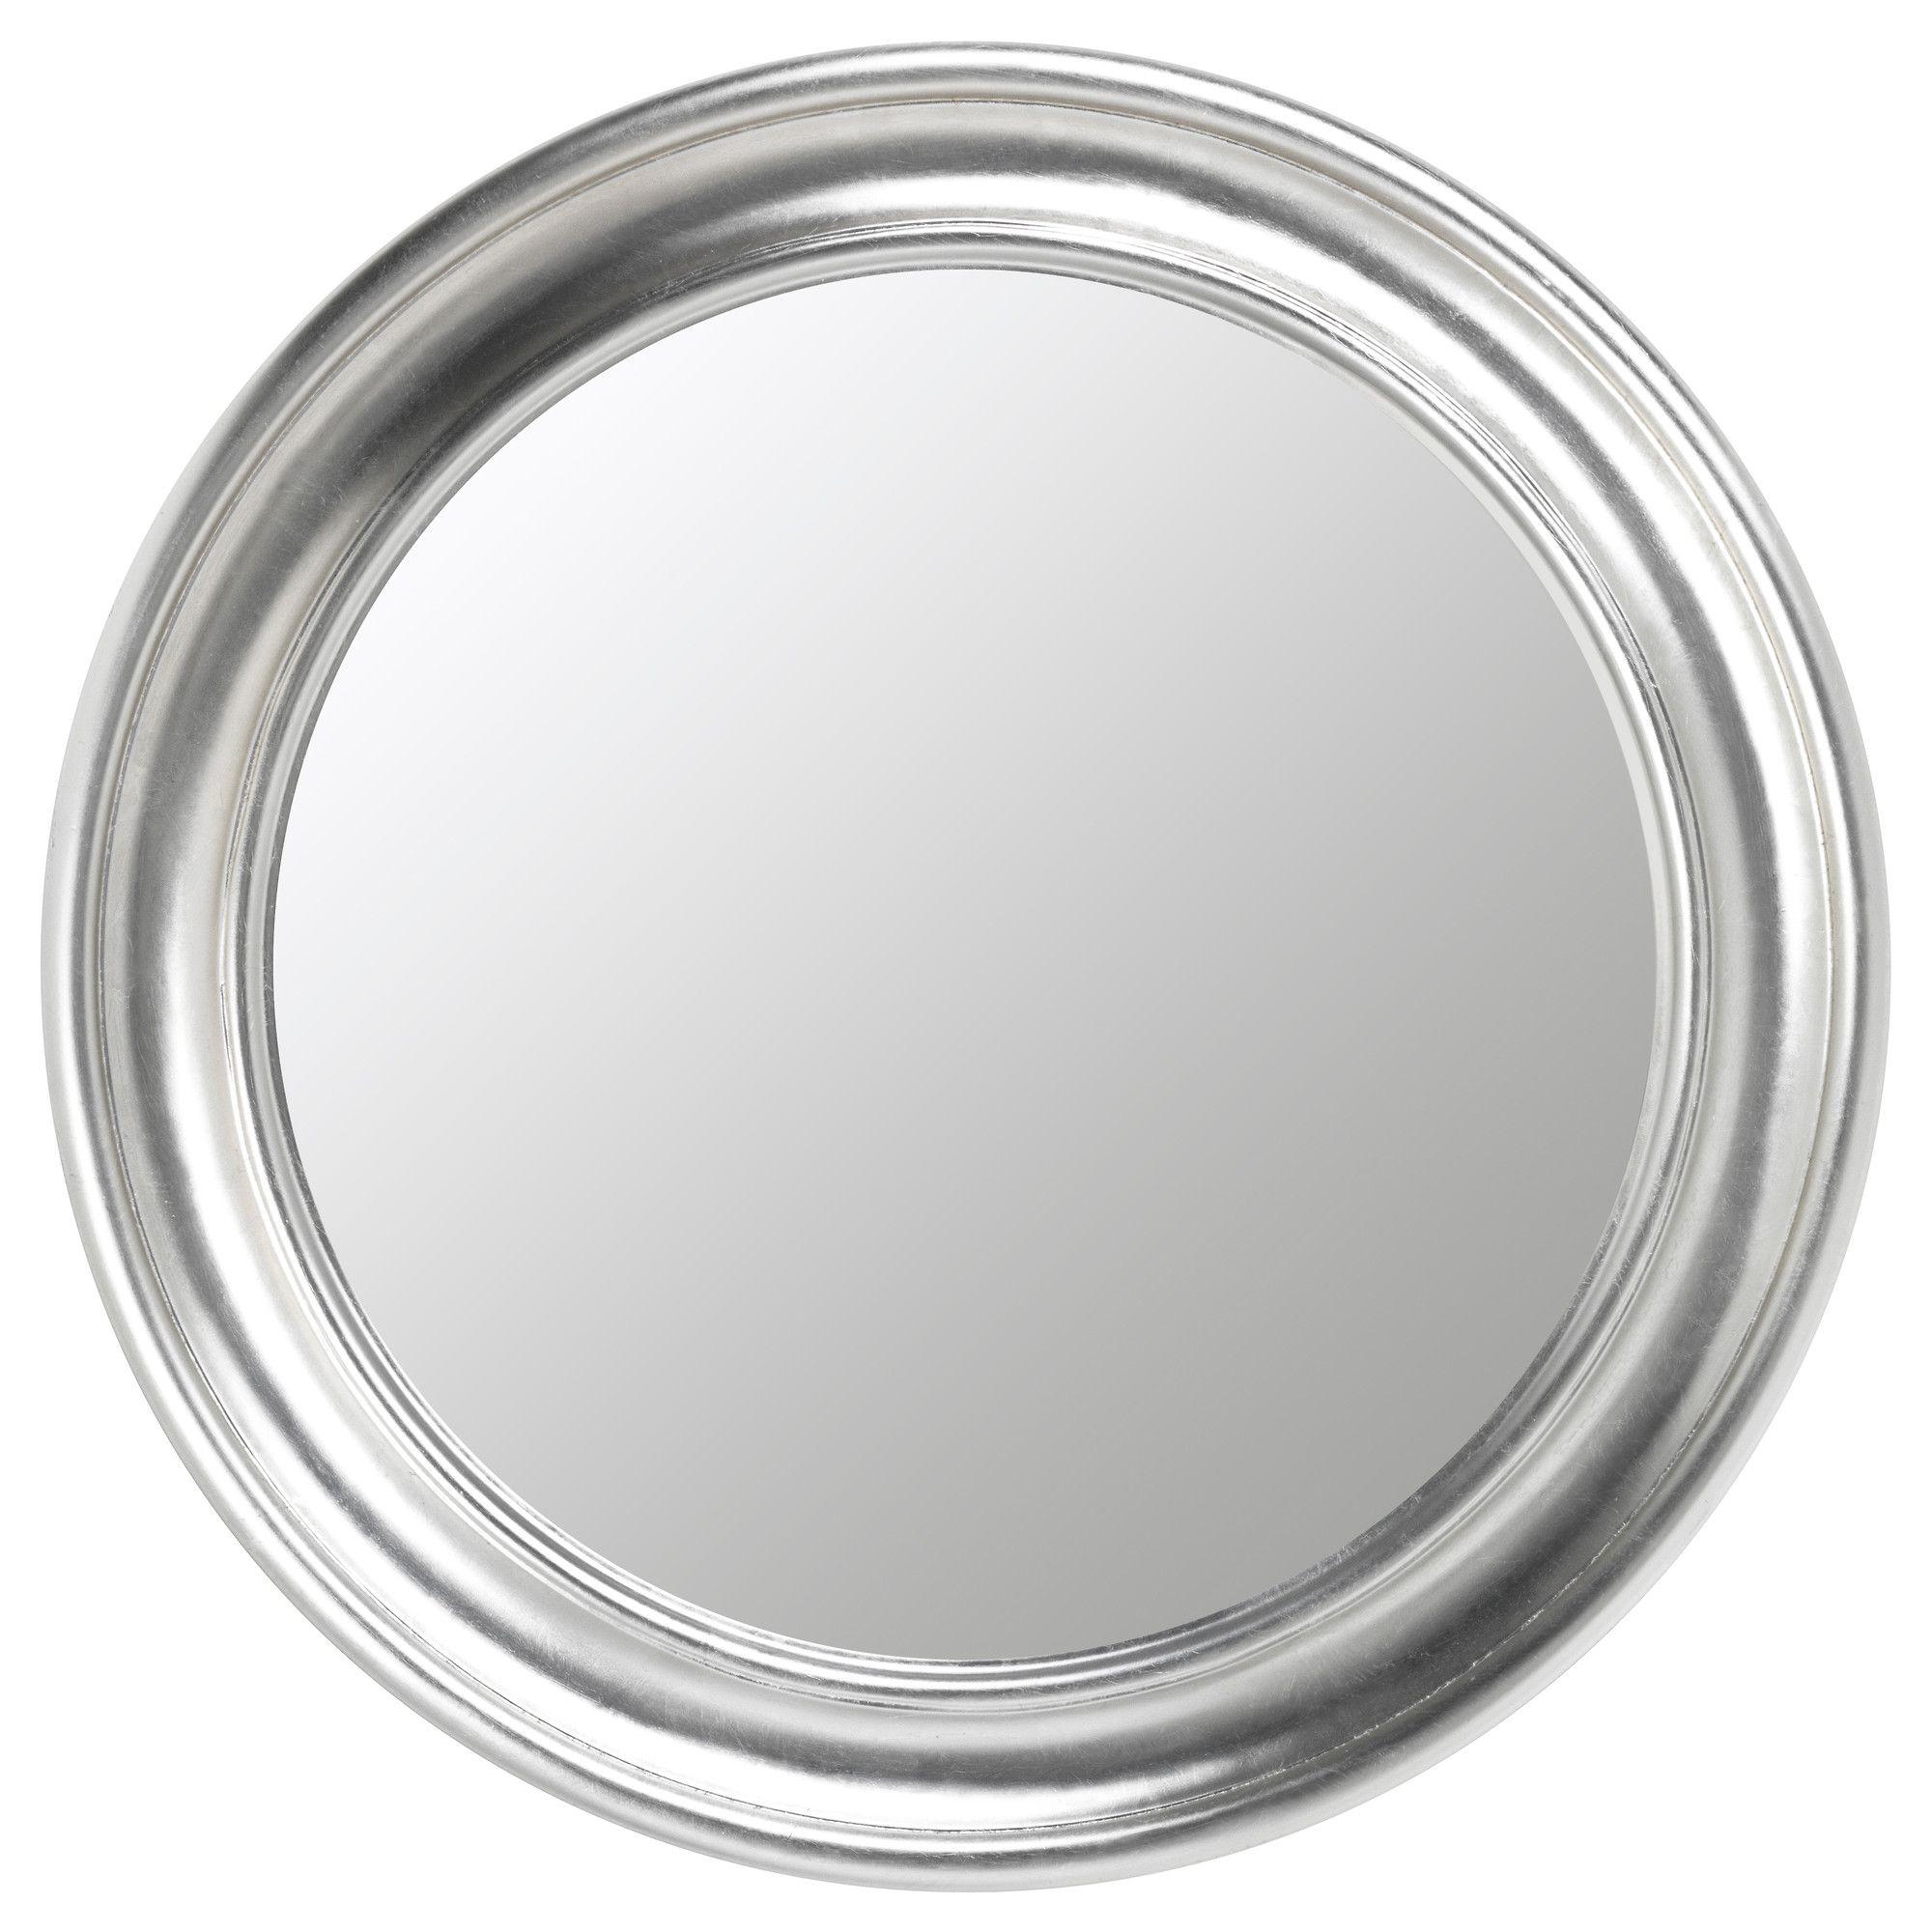 Ikea Us Furniture And Home Furnishings Songe Mirror Wall Mirrors Ikea Ikea Mirror